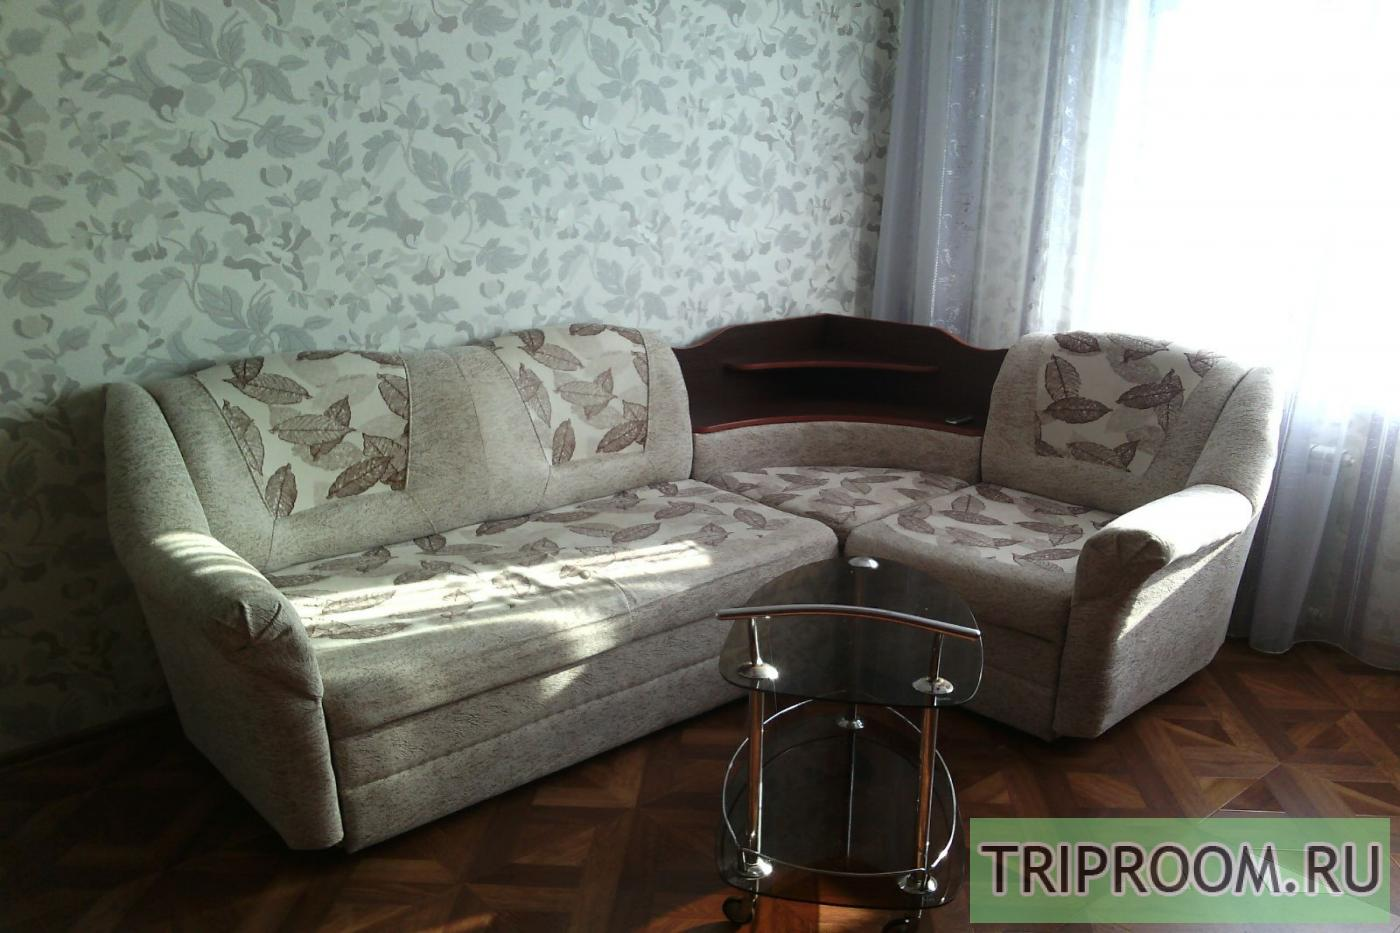 2-комнатная квартира посуточно (вариант № 33661), ул. Морозова Павла Леонтьевича, фото № 8